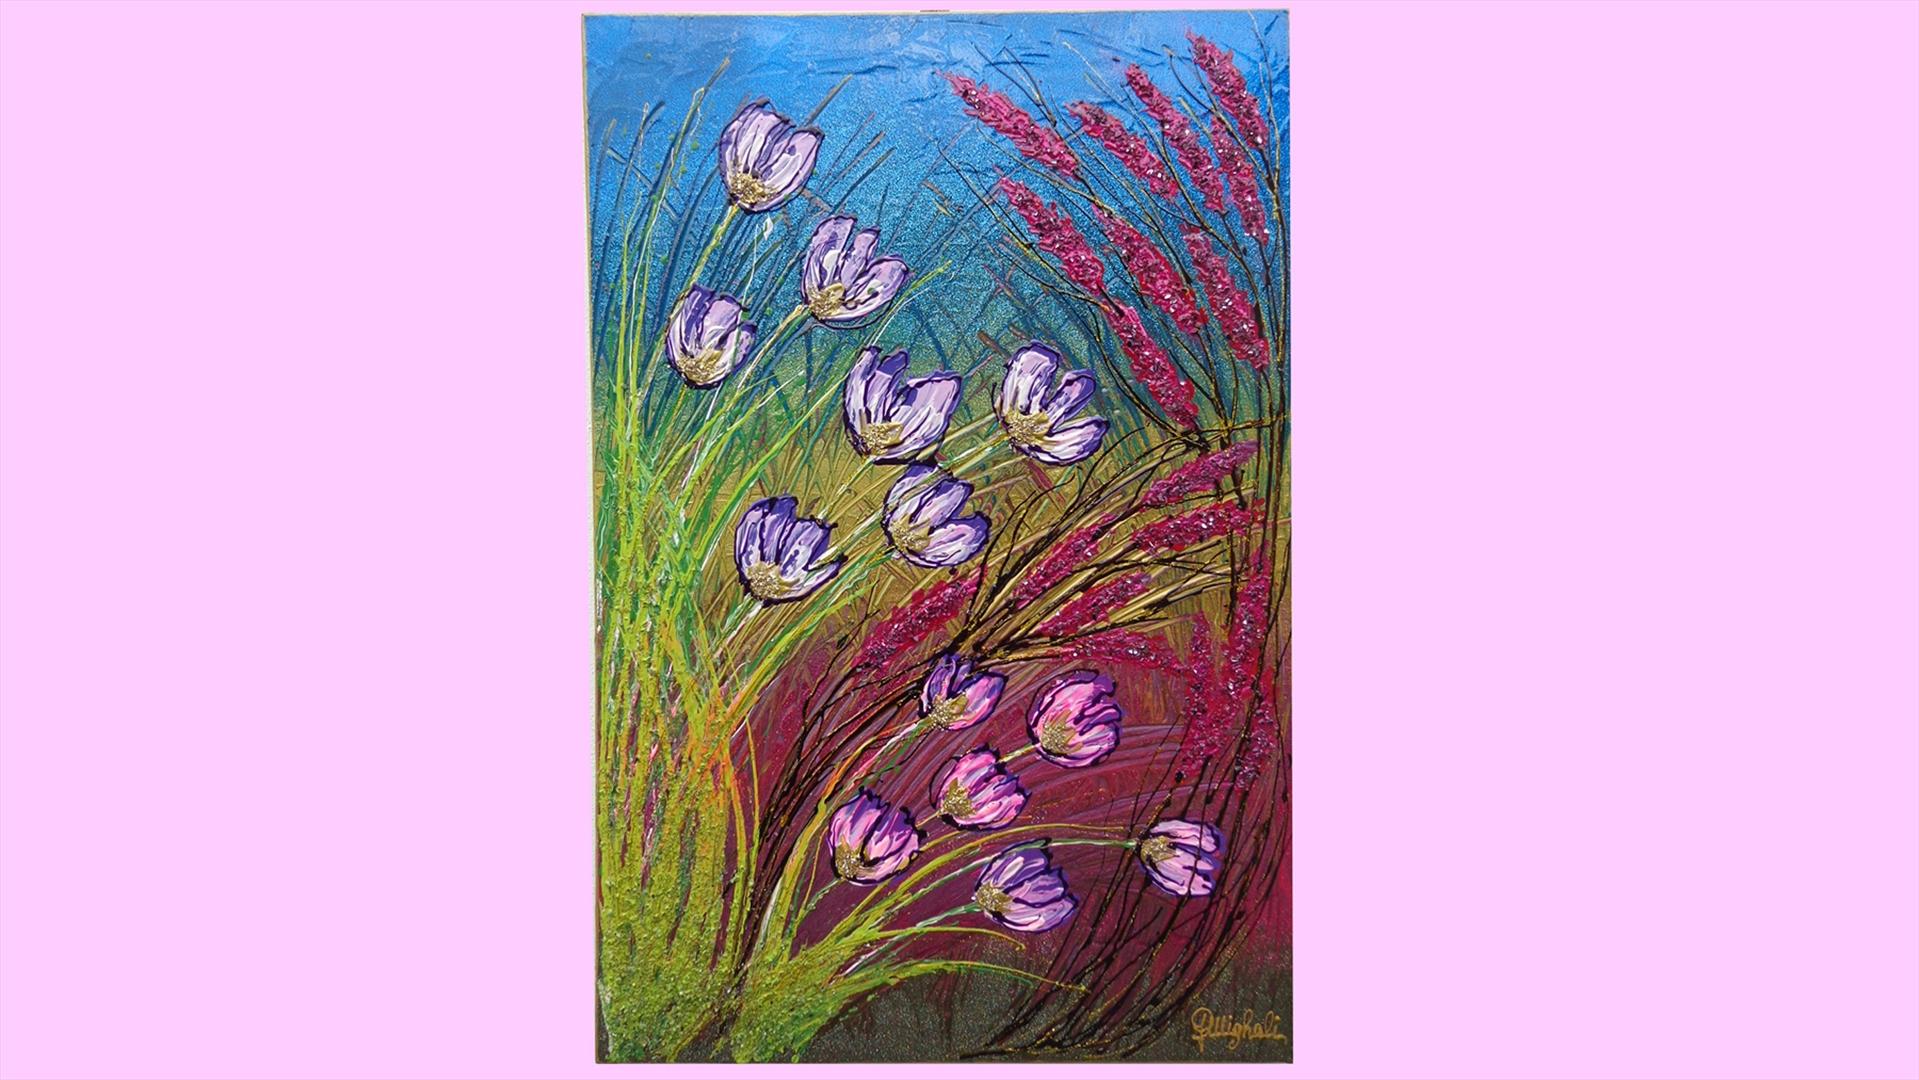 Cespugli di fiori vendita quadri online quadri moderni for Quadri moderni fiori dipinti a mano